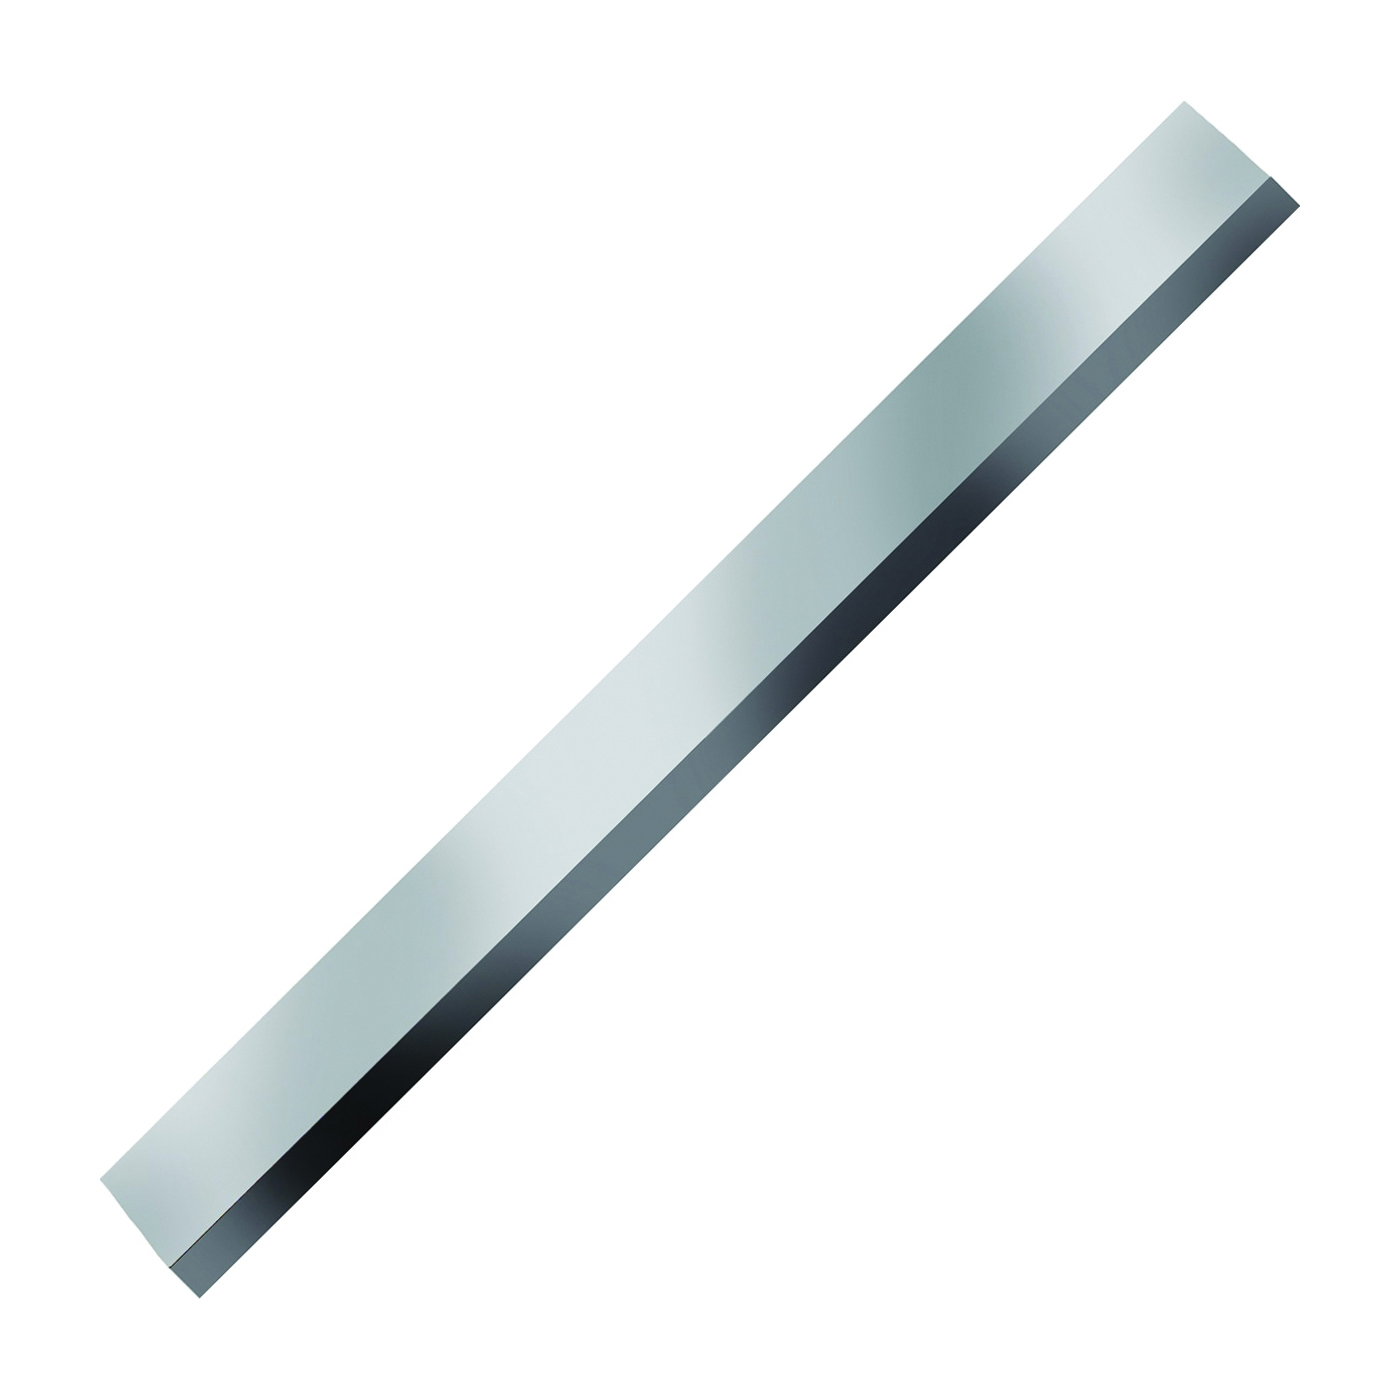 Picture of HYDE 11180 Scraper Blade, Double-Edged Blade, 2-1/2 in W Blade, Tungsten Carbide Blade